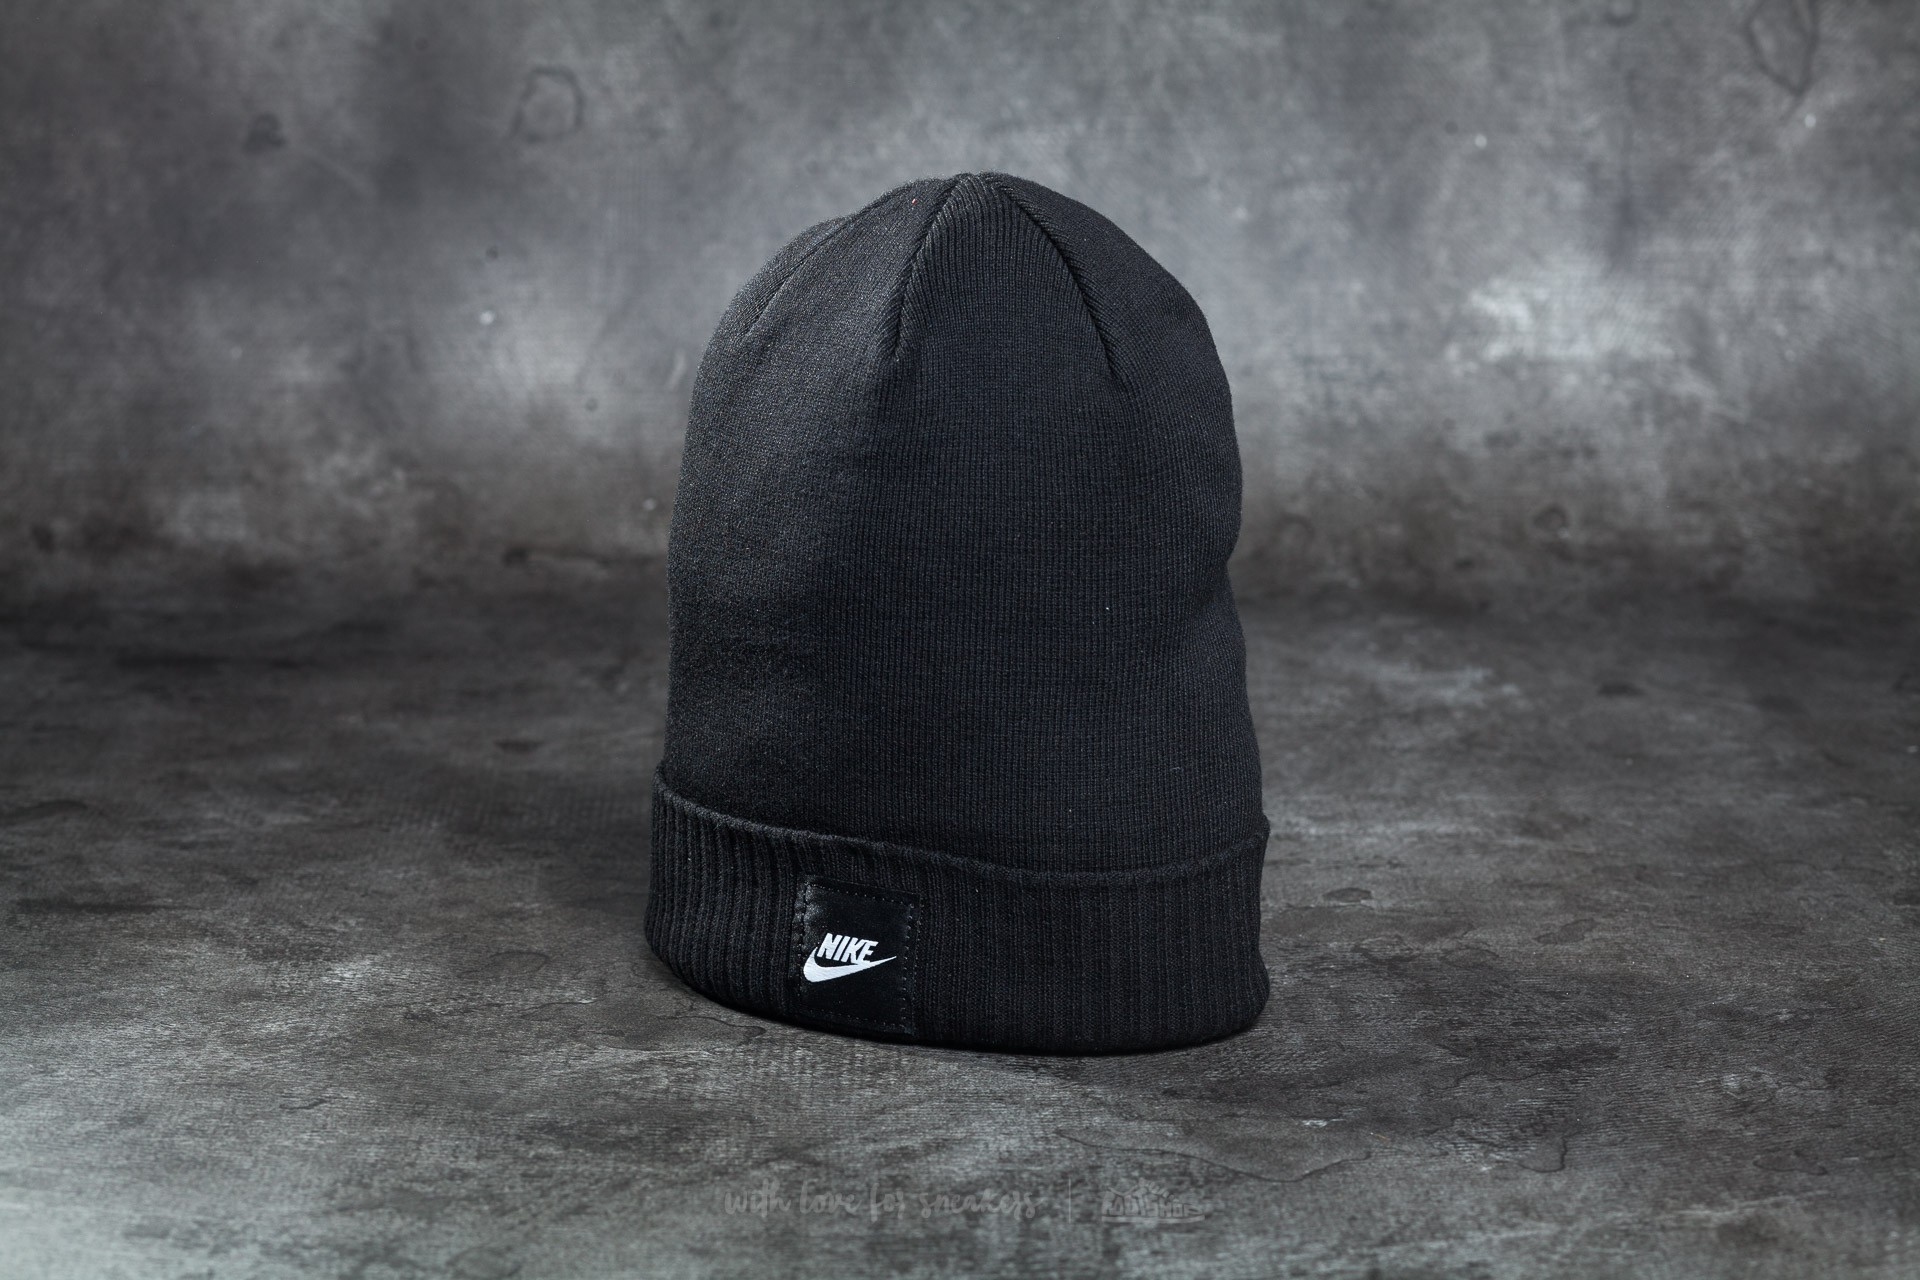 b76996f4667 Nike Futura Beanie Black